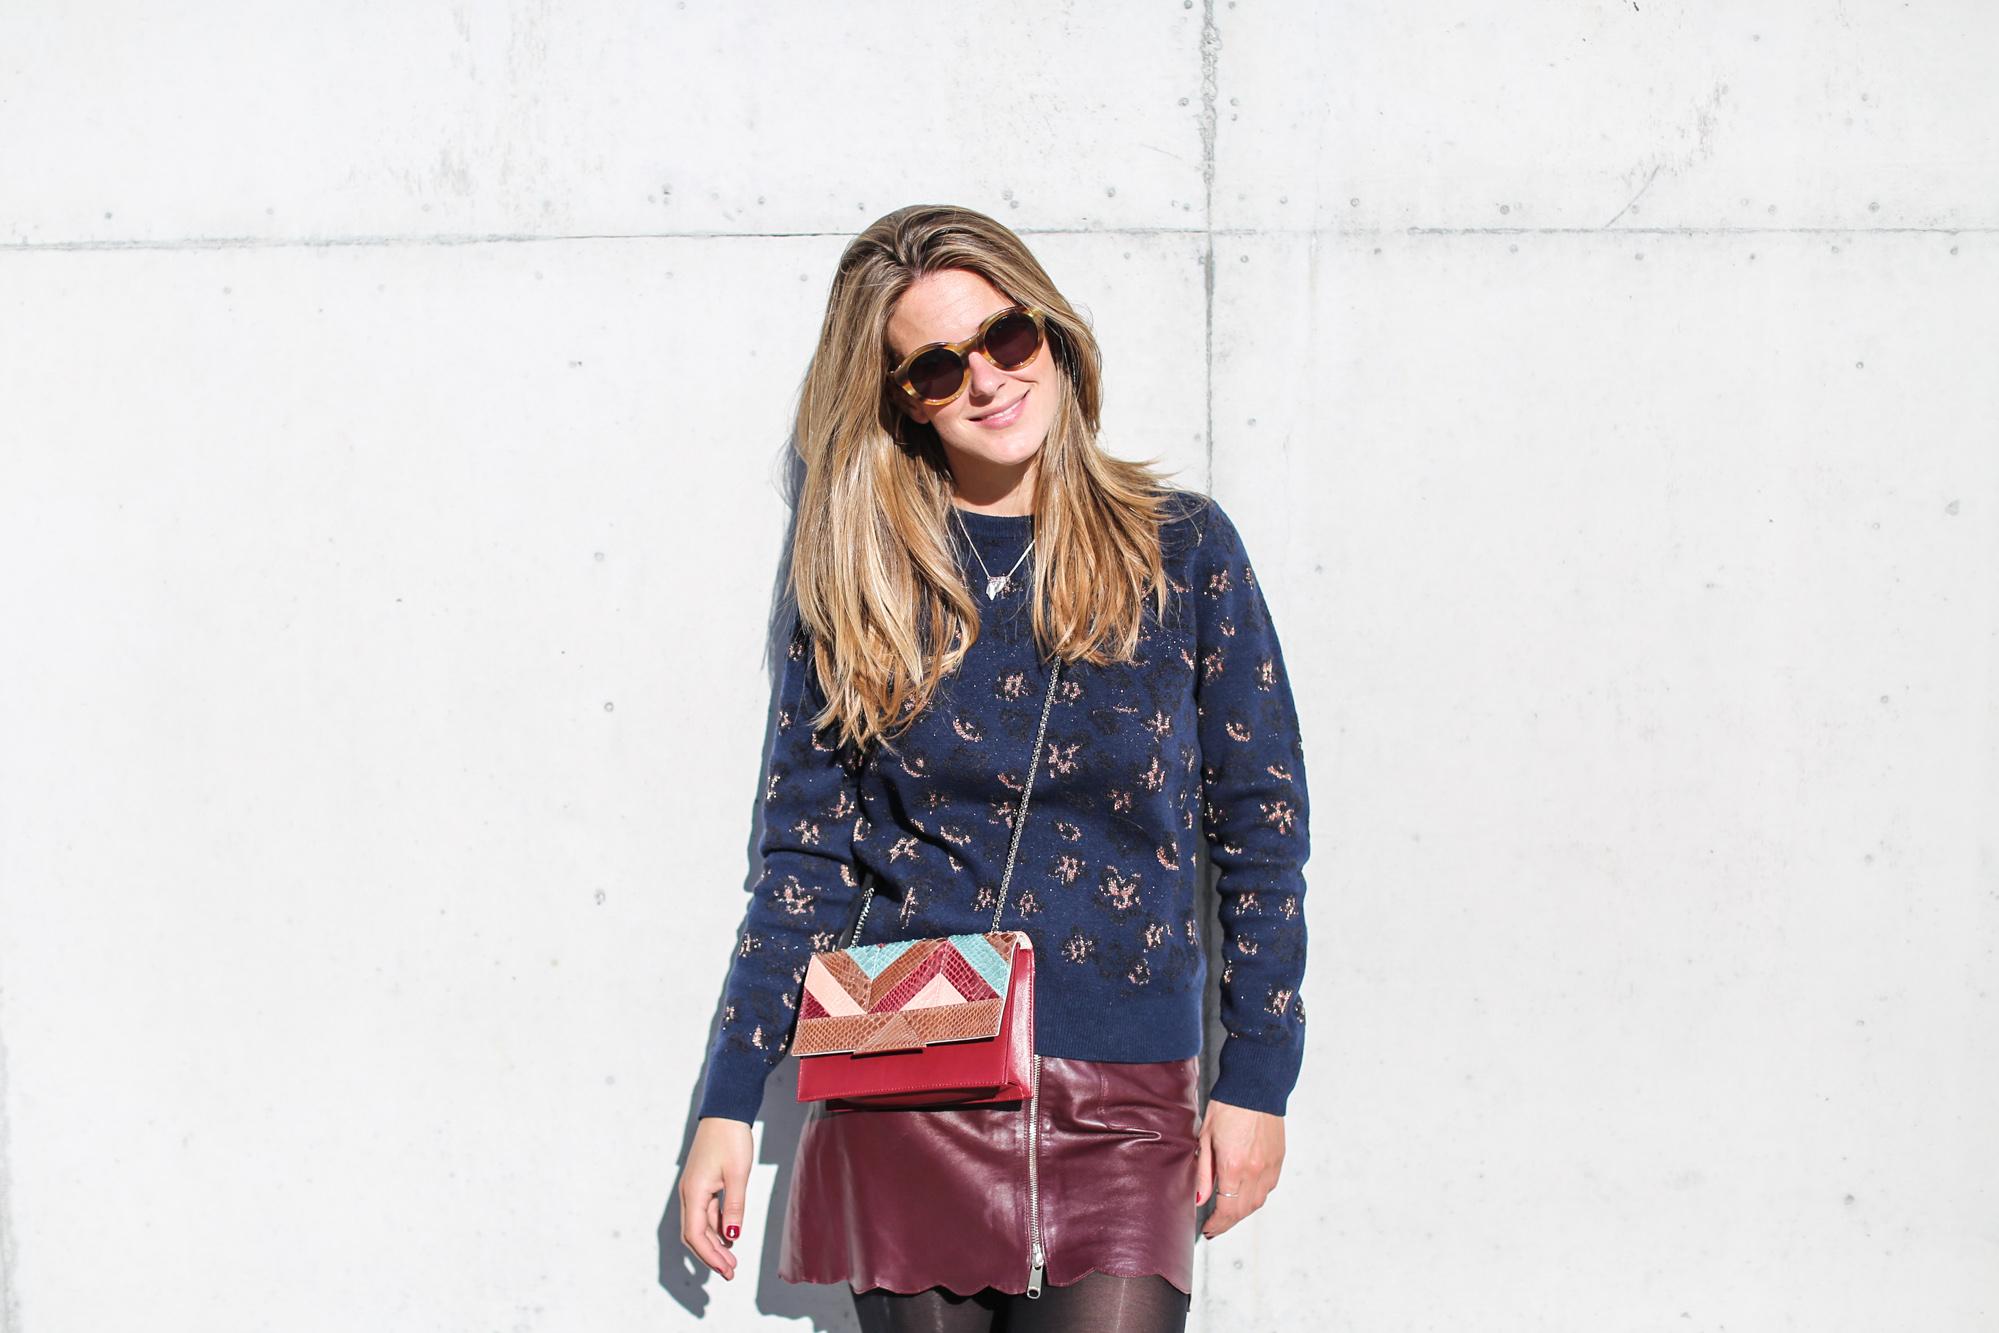 Clochet_fashionblogger_streetstyle_andotherstories_metallicflowersknit_heroscarf_leatherminiskirt-10